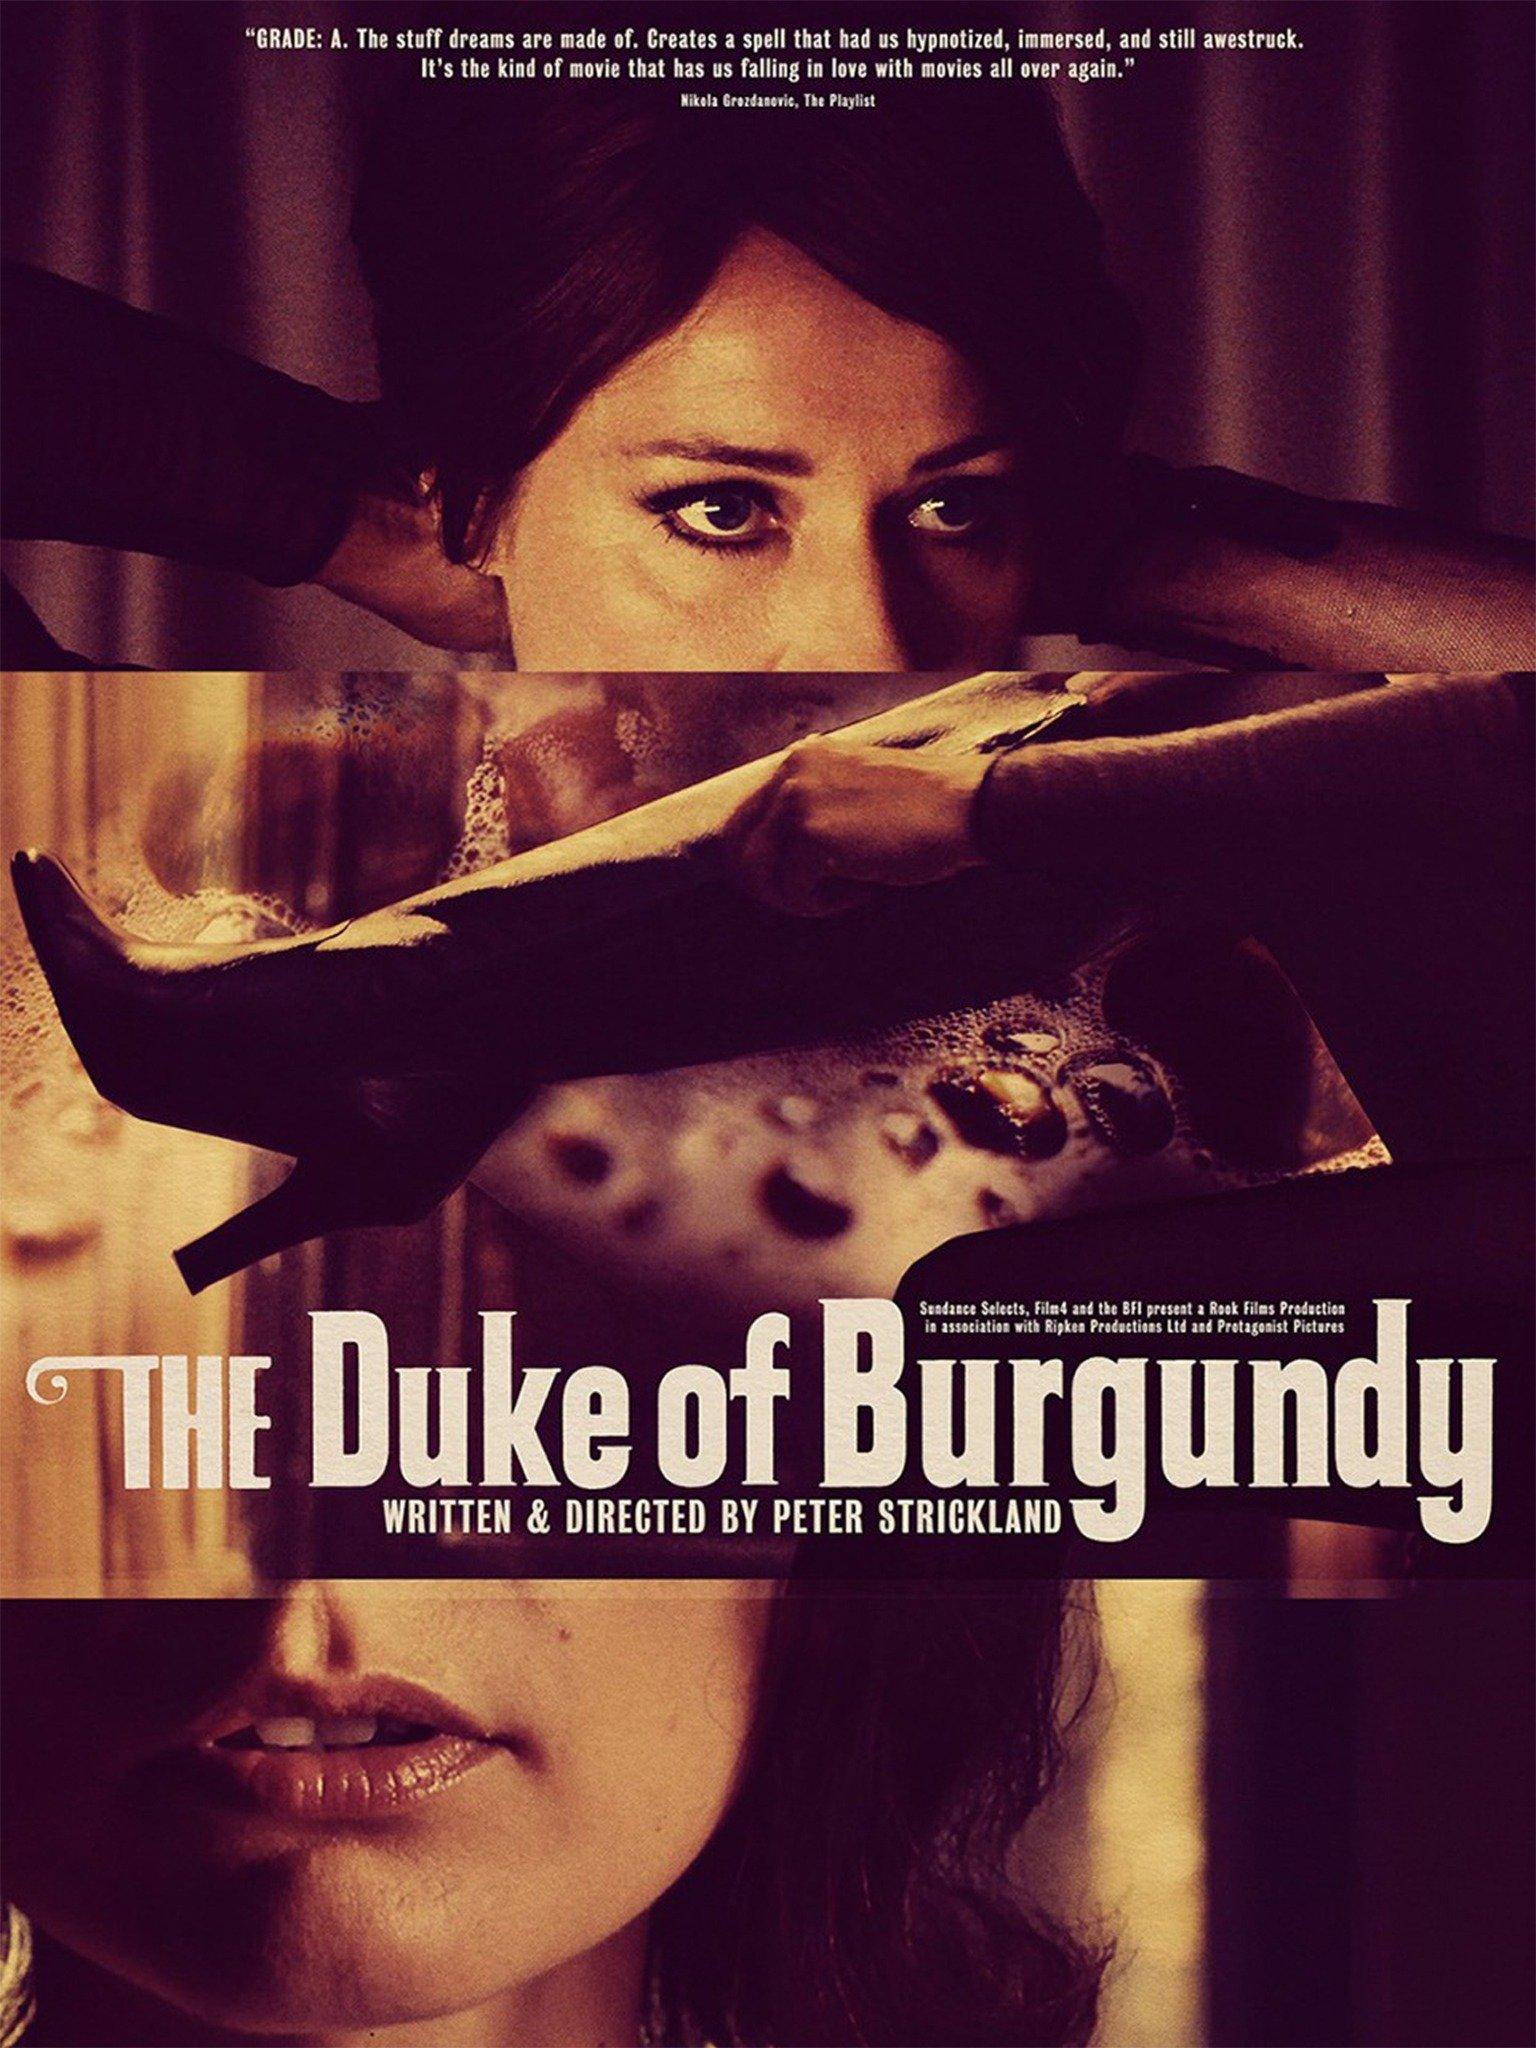 The duke of burgundy director punctures eroticism